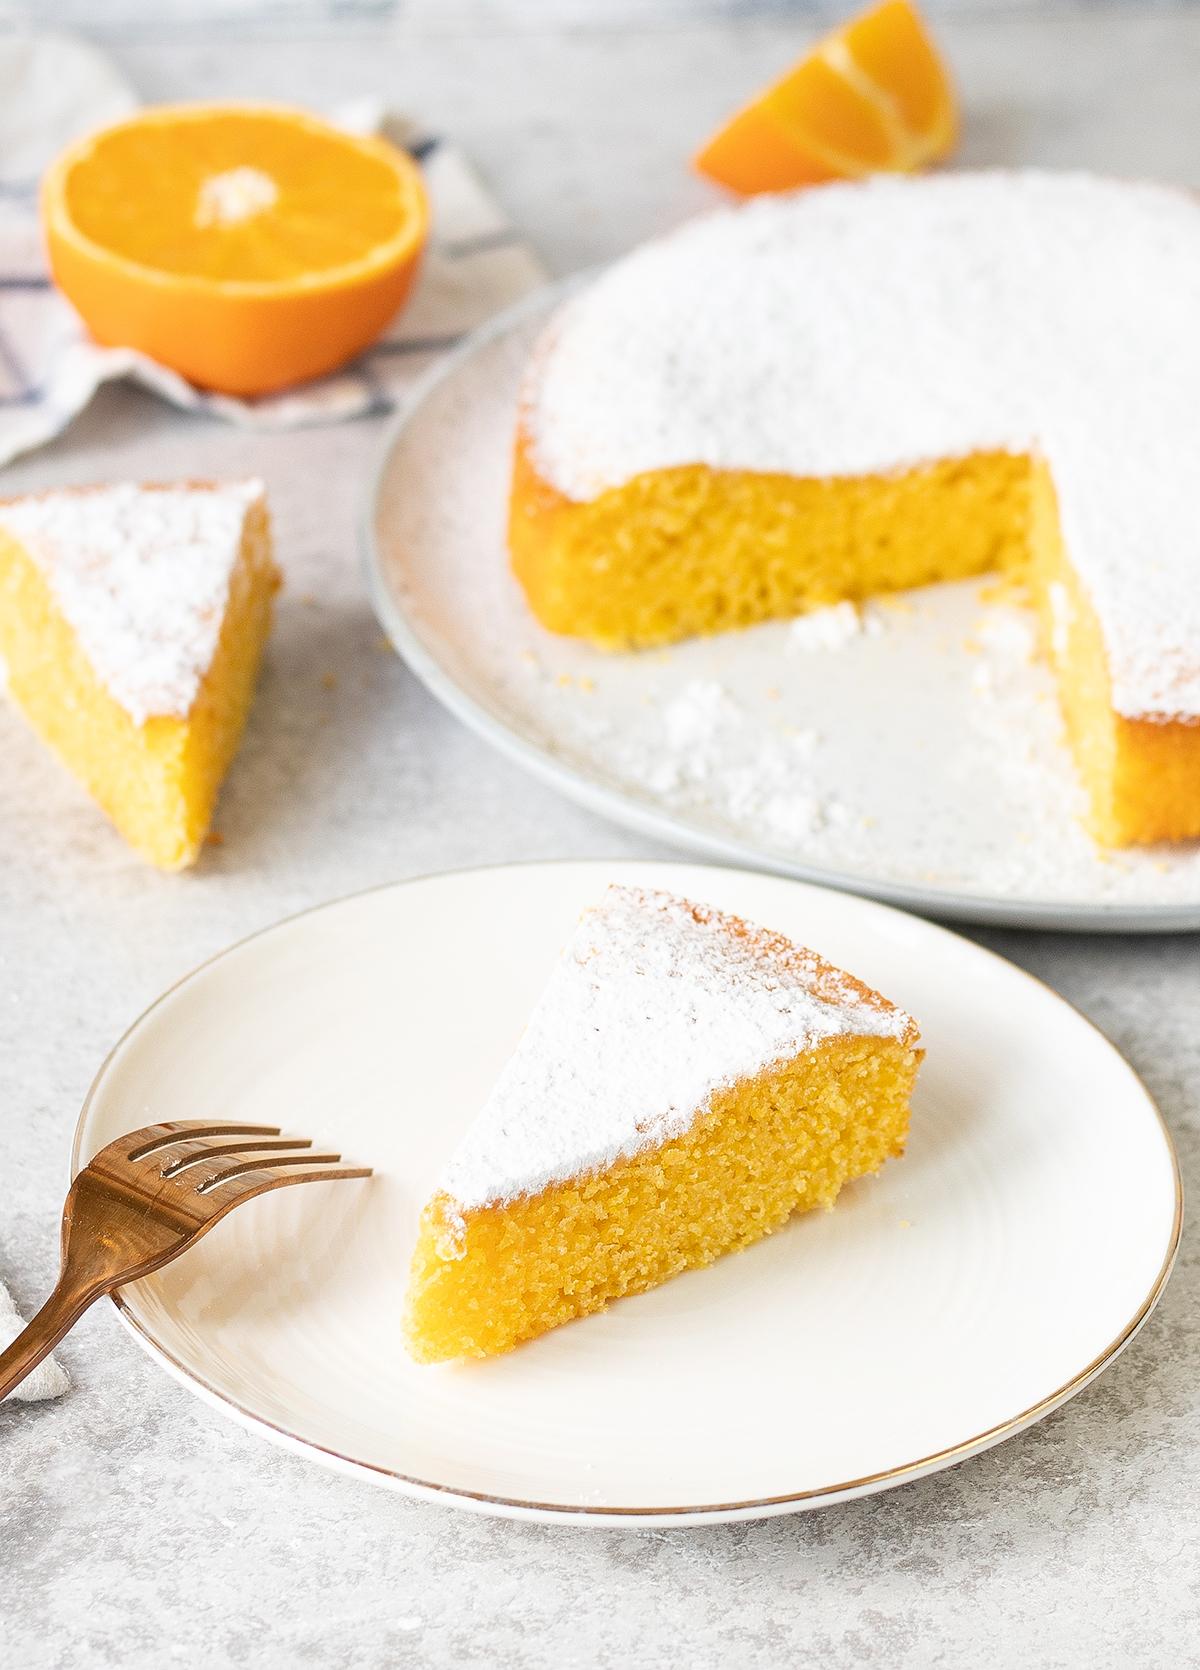 Orange Polenta Cake is a simple Italian-style cake